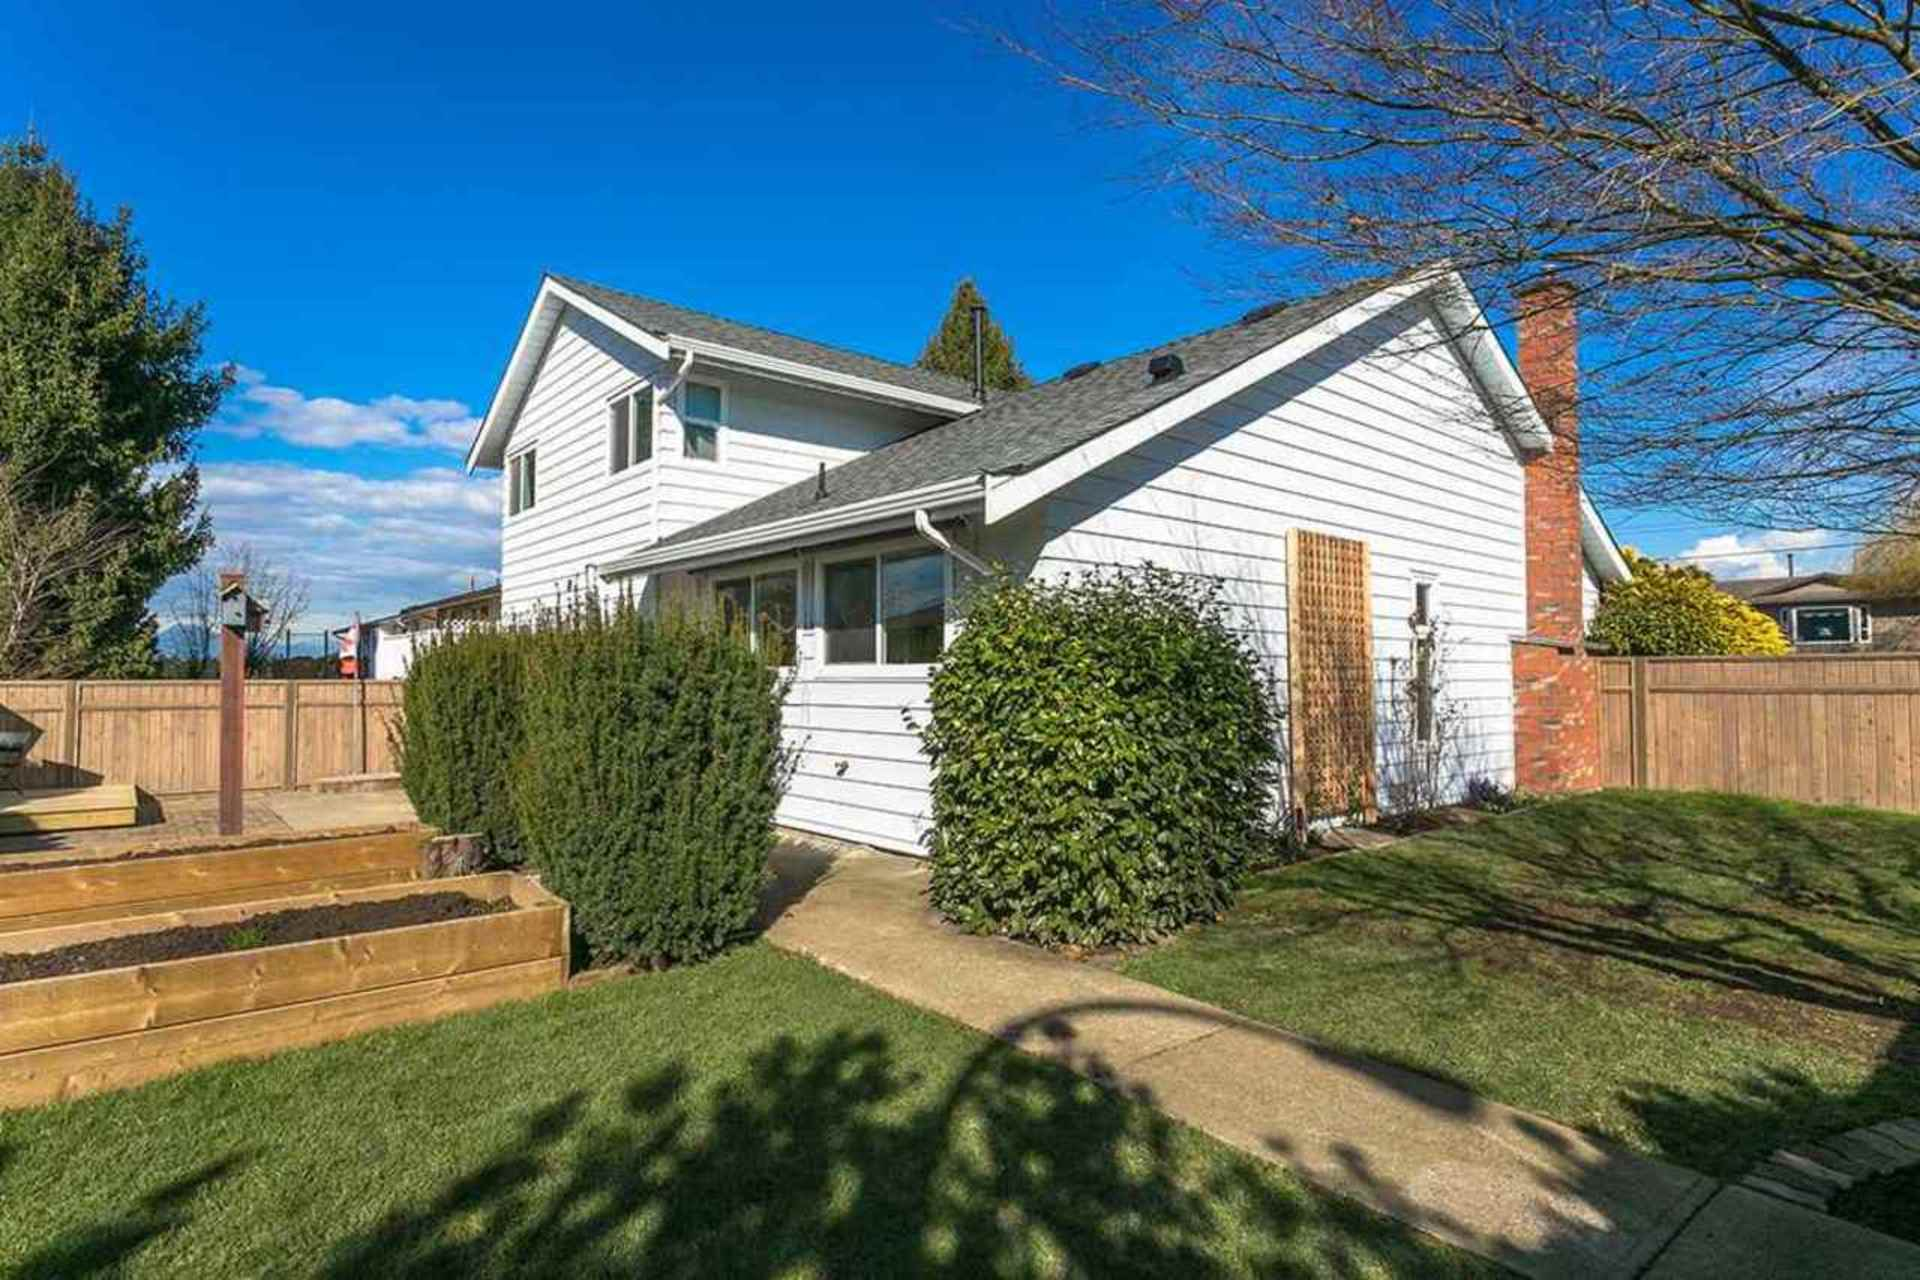 9299-213-street-walnut-grove-langley-19 at 9299 213 Street, Walnut Grove, Langley